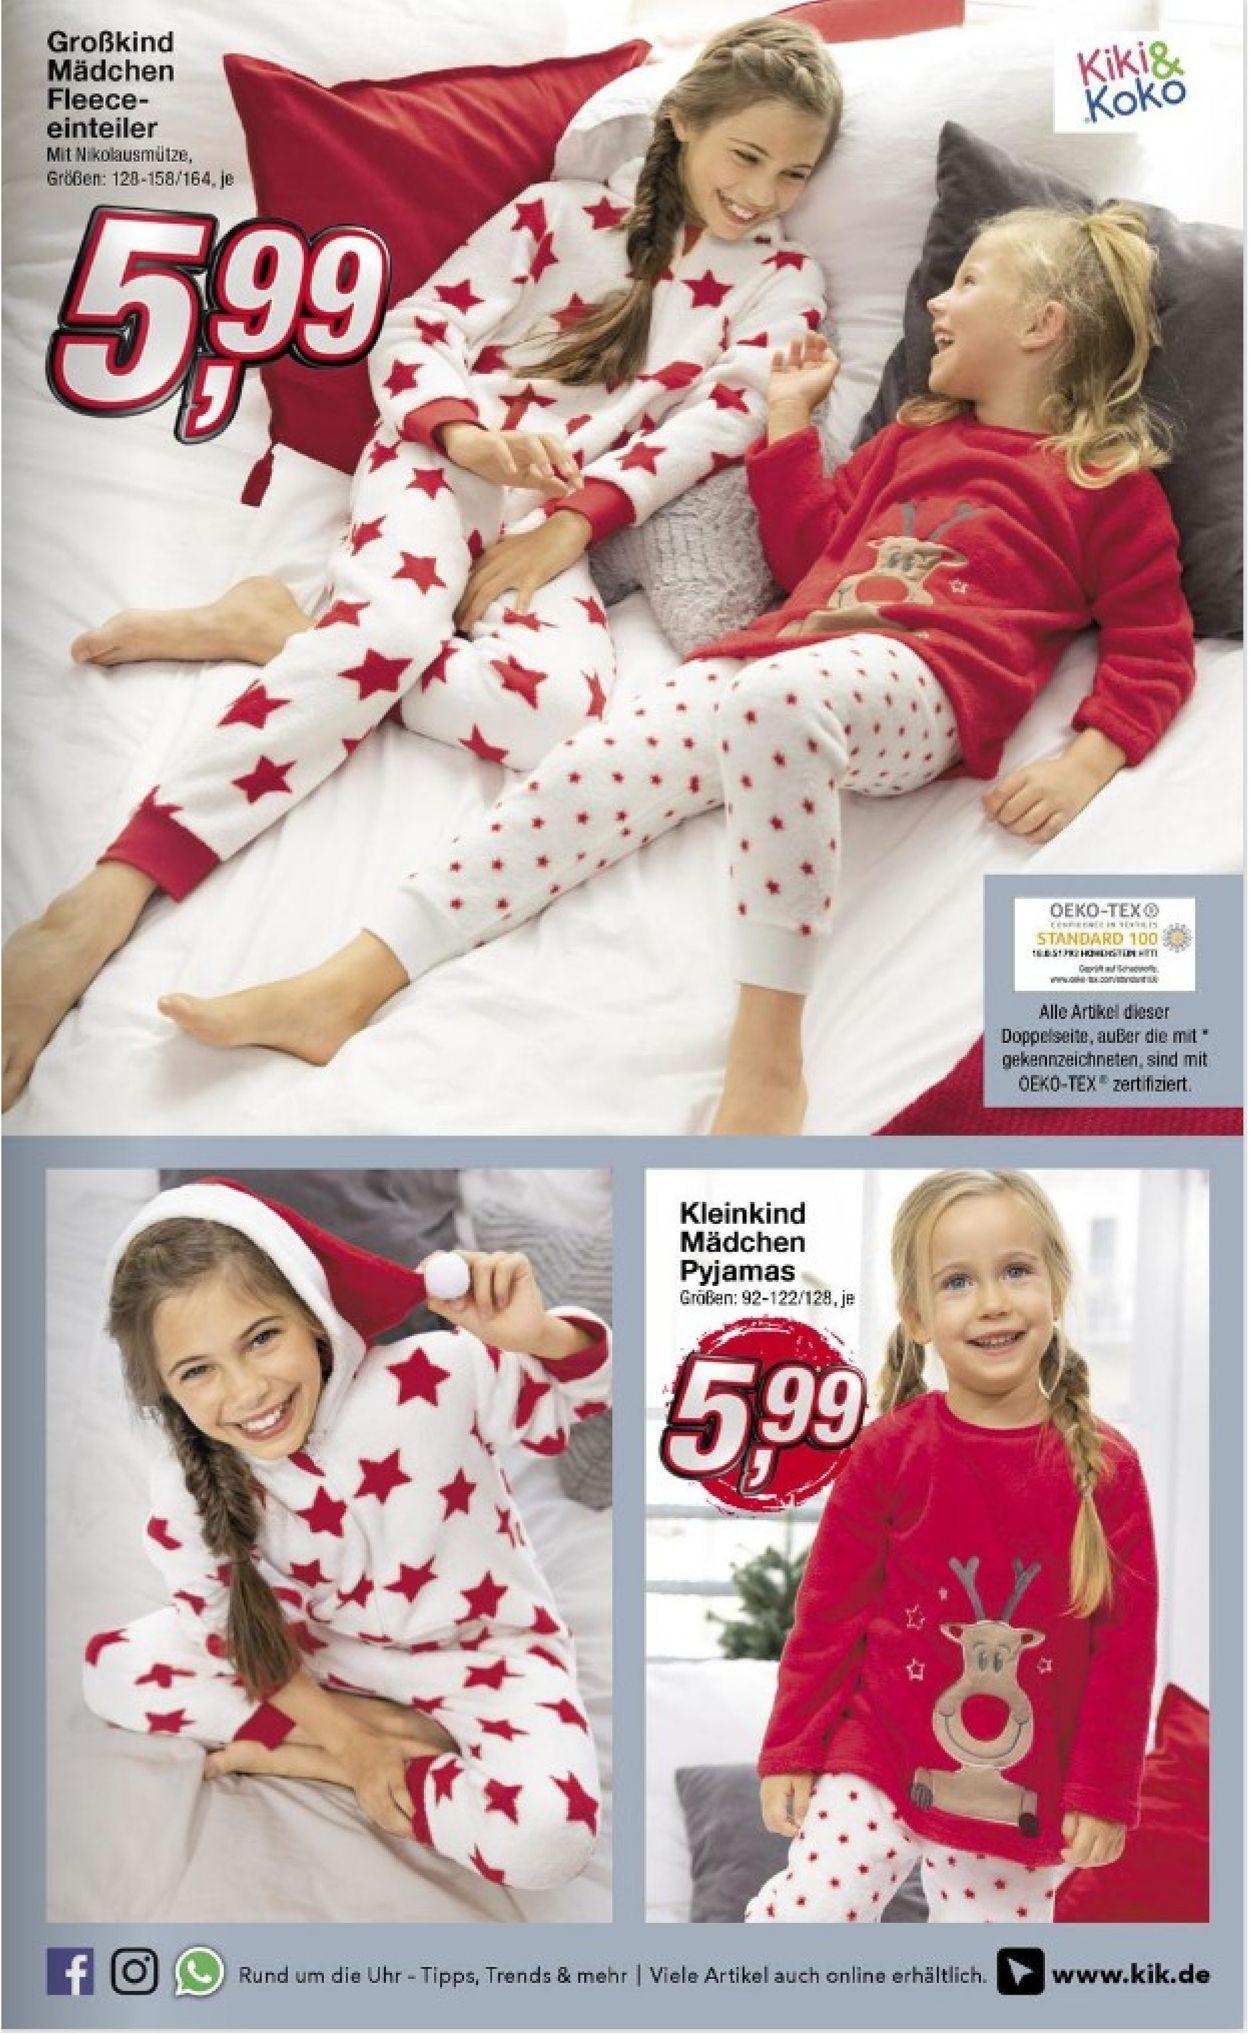 preambula rezerva bednik pyjama kik